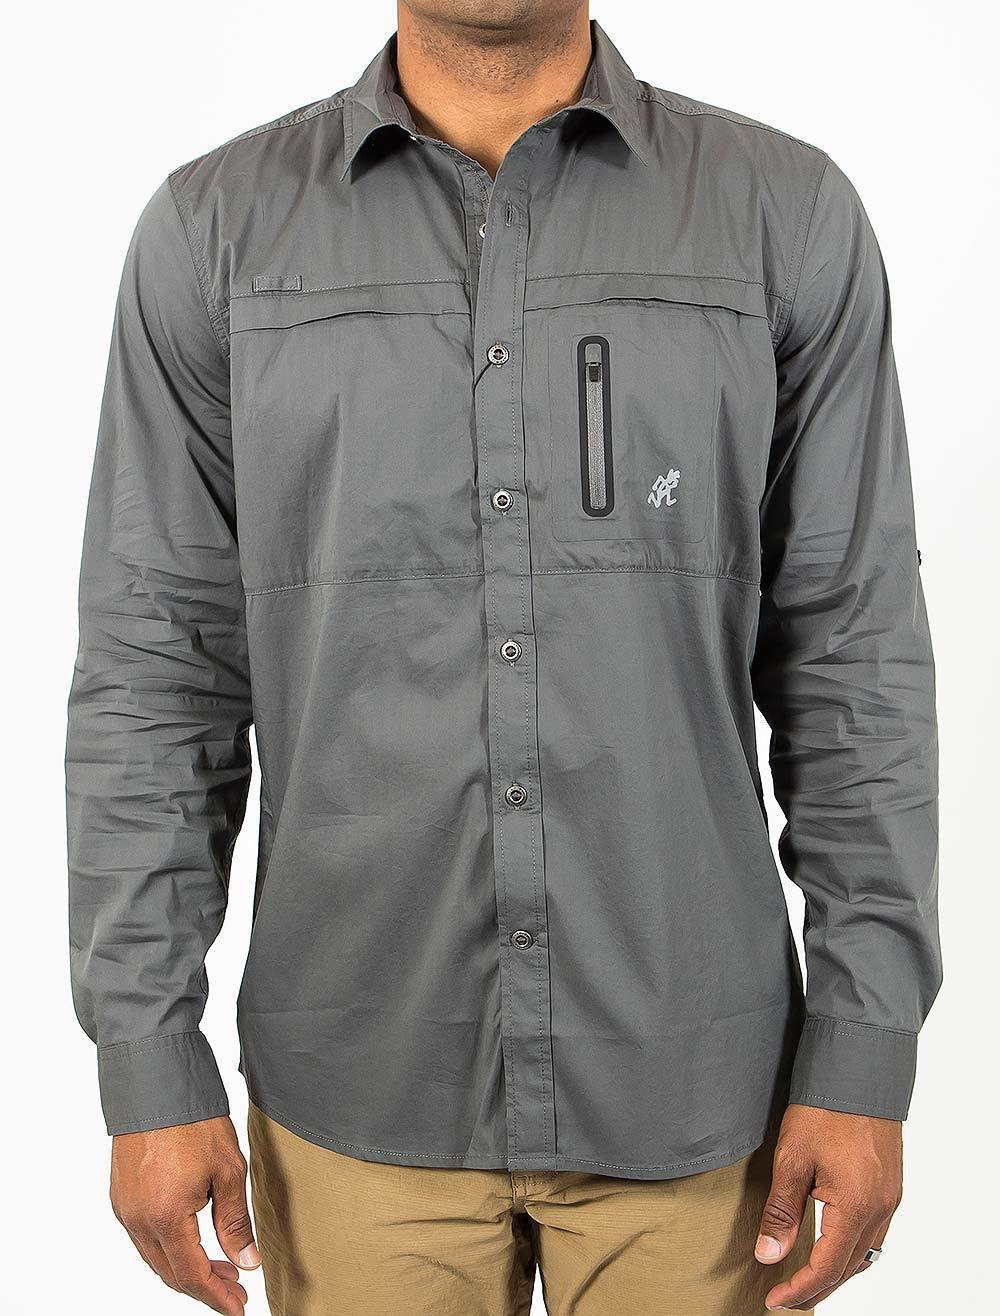 Gramicci No-Squito Men's Long Sleeve Shirt